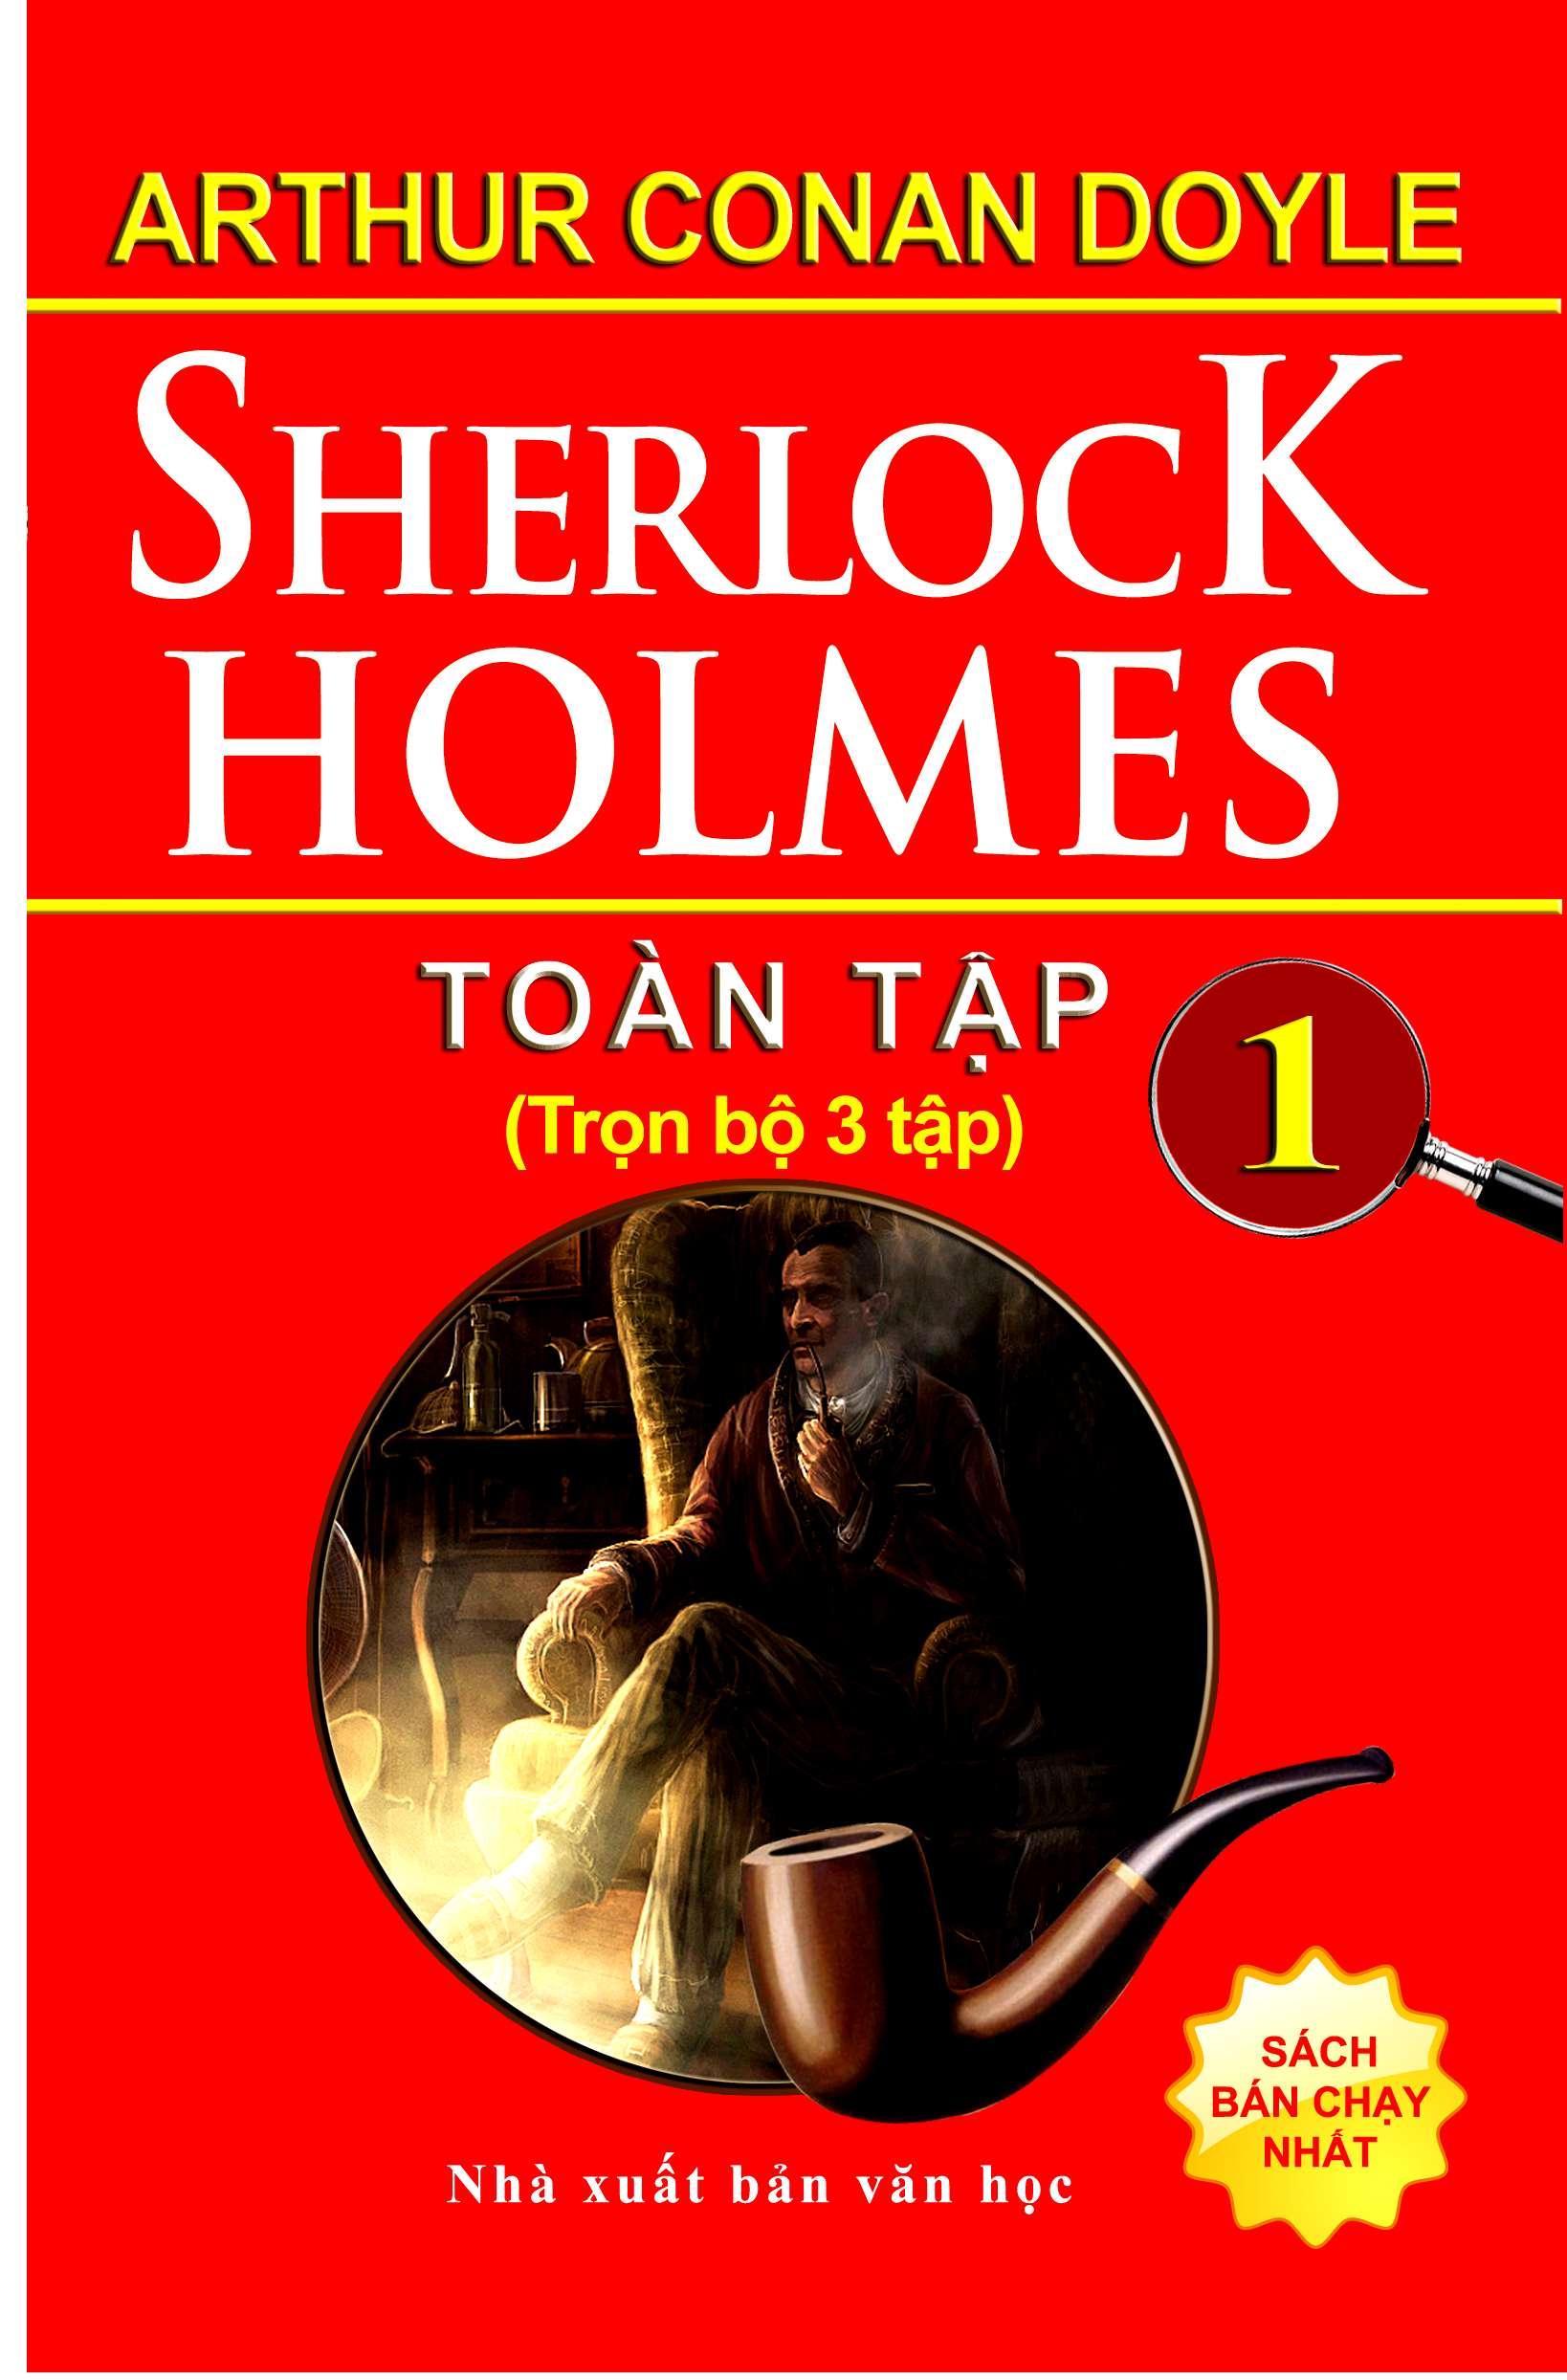 sherlock-holmes-toan-tap---arthur-conan-doyle